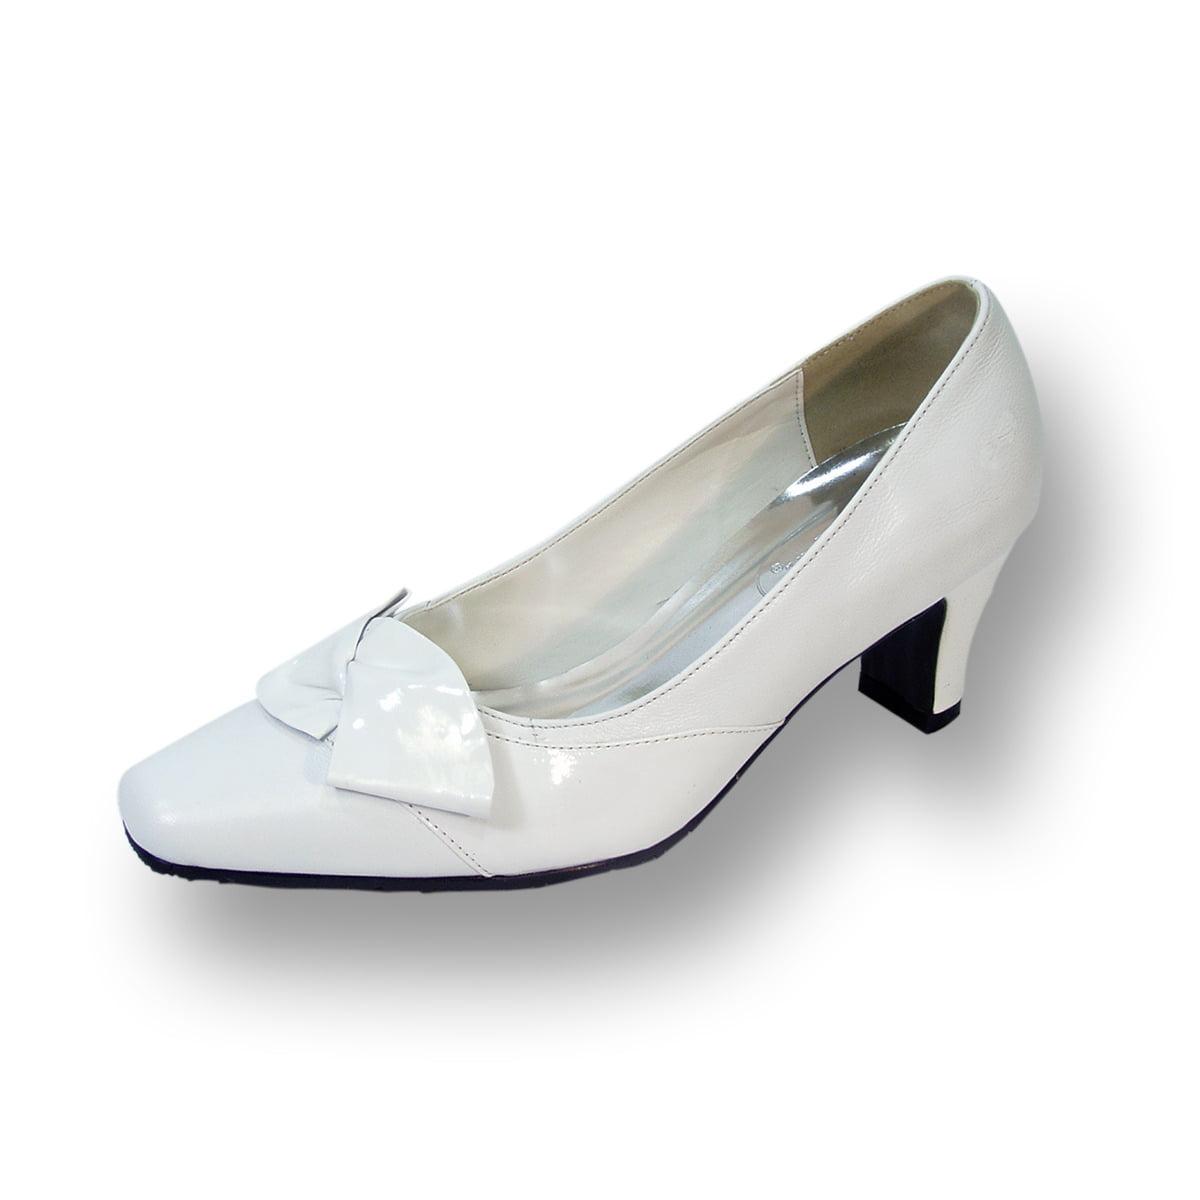 Peerage Lori Women Wide Width Leather Dress Pump White 10